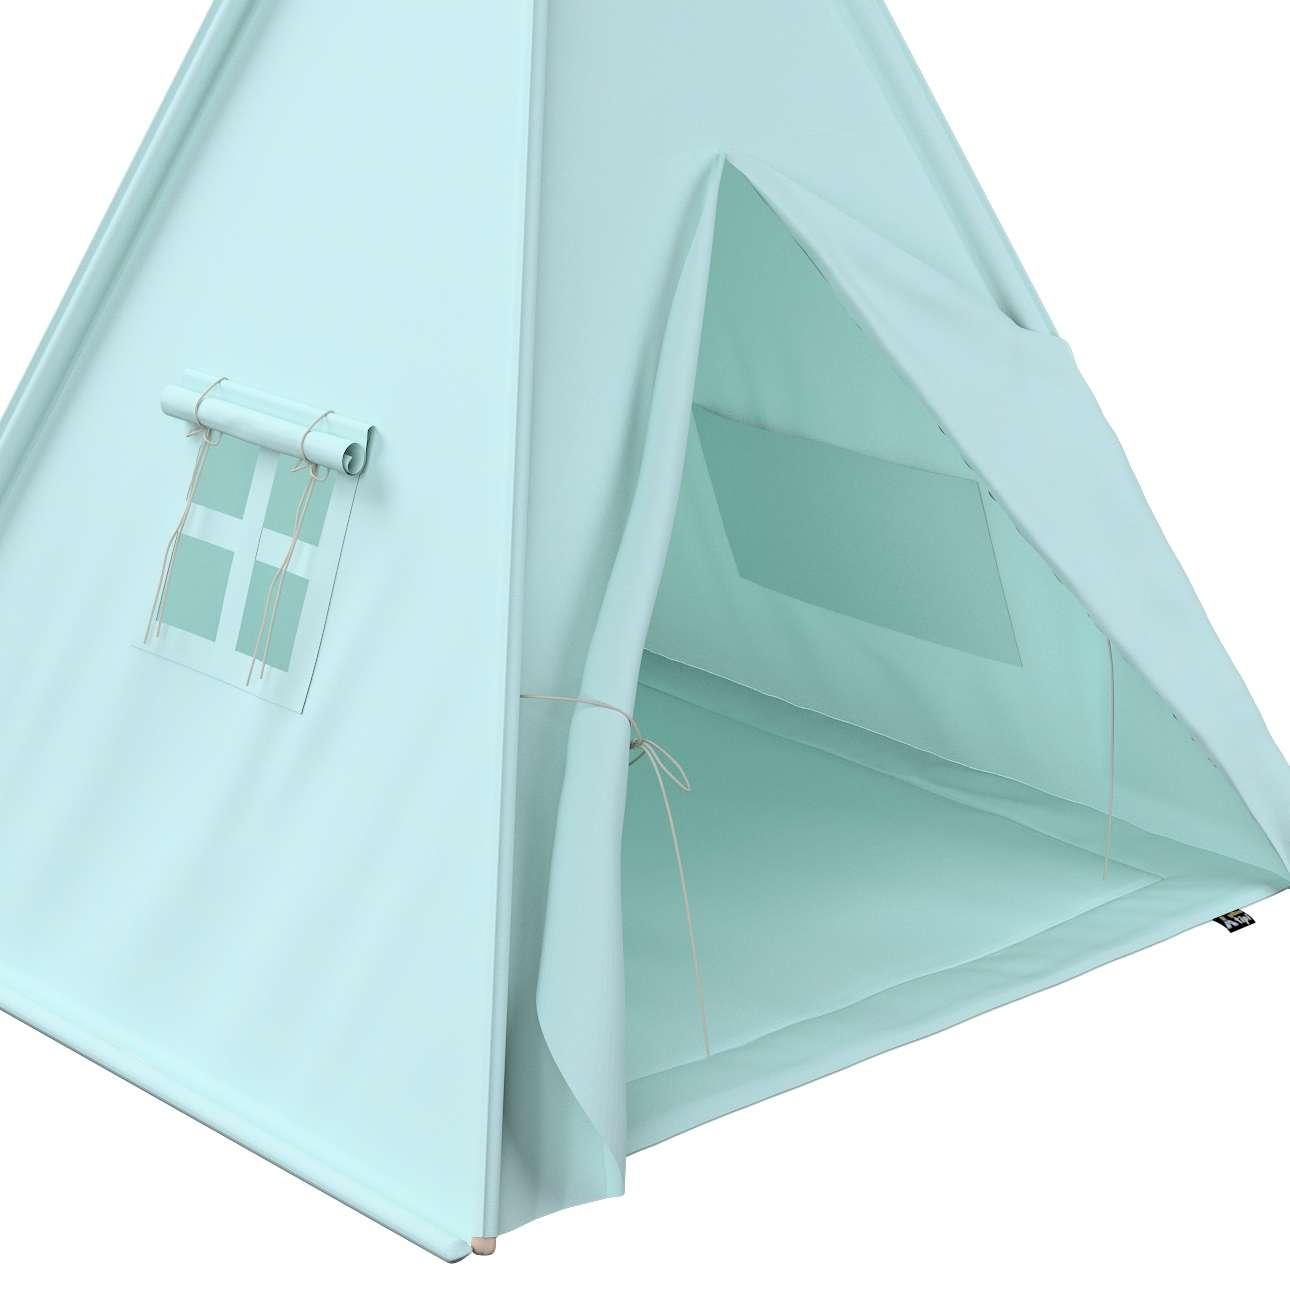 Tipi-Zelt von der Kollektion Cotton Story, Stoff: 702-10